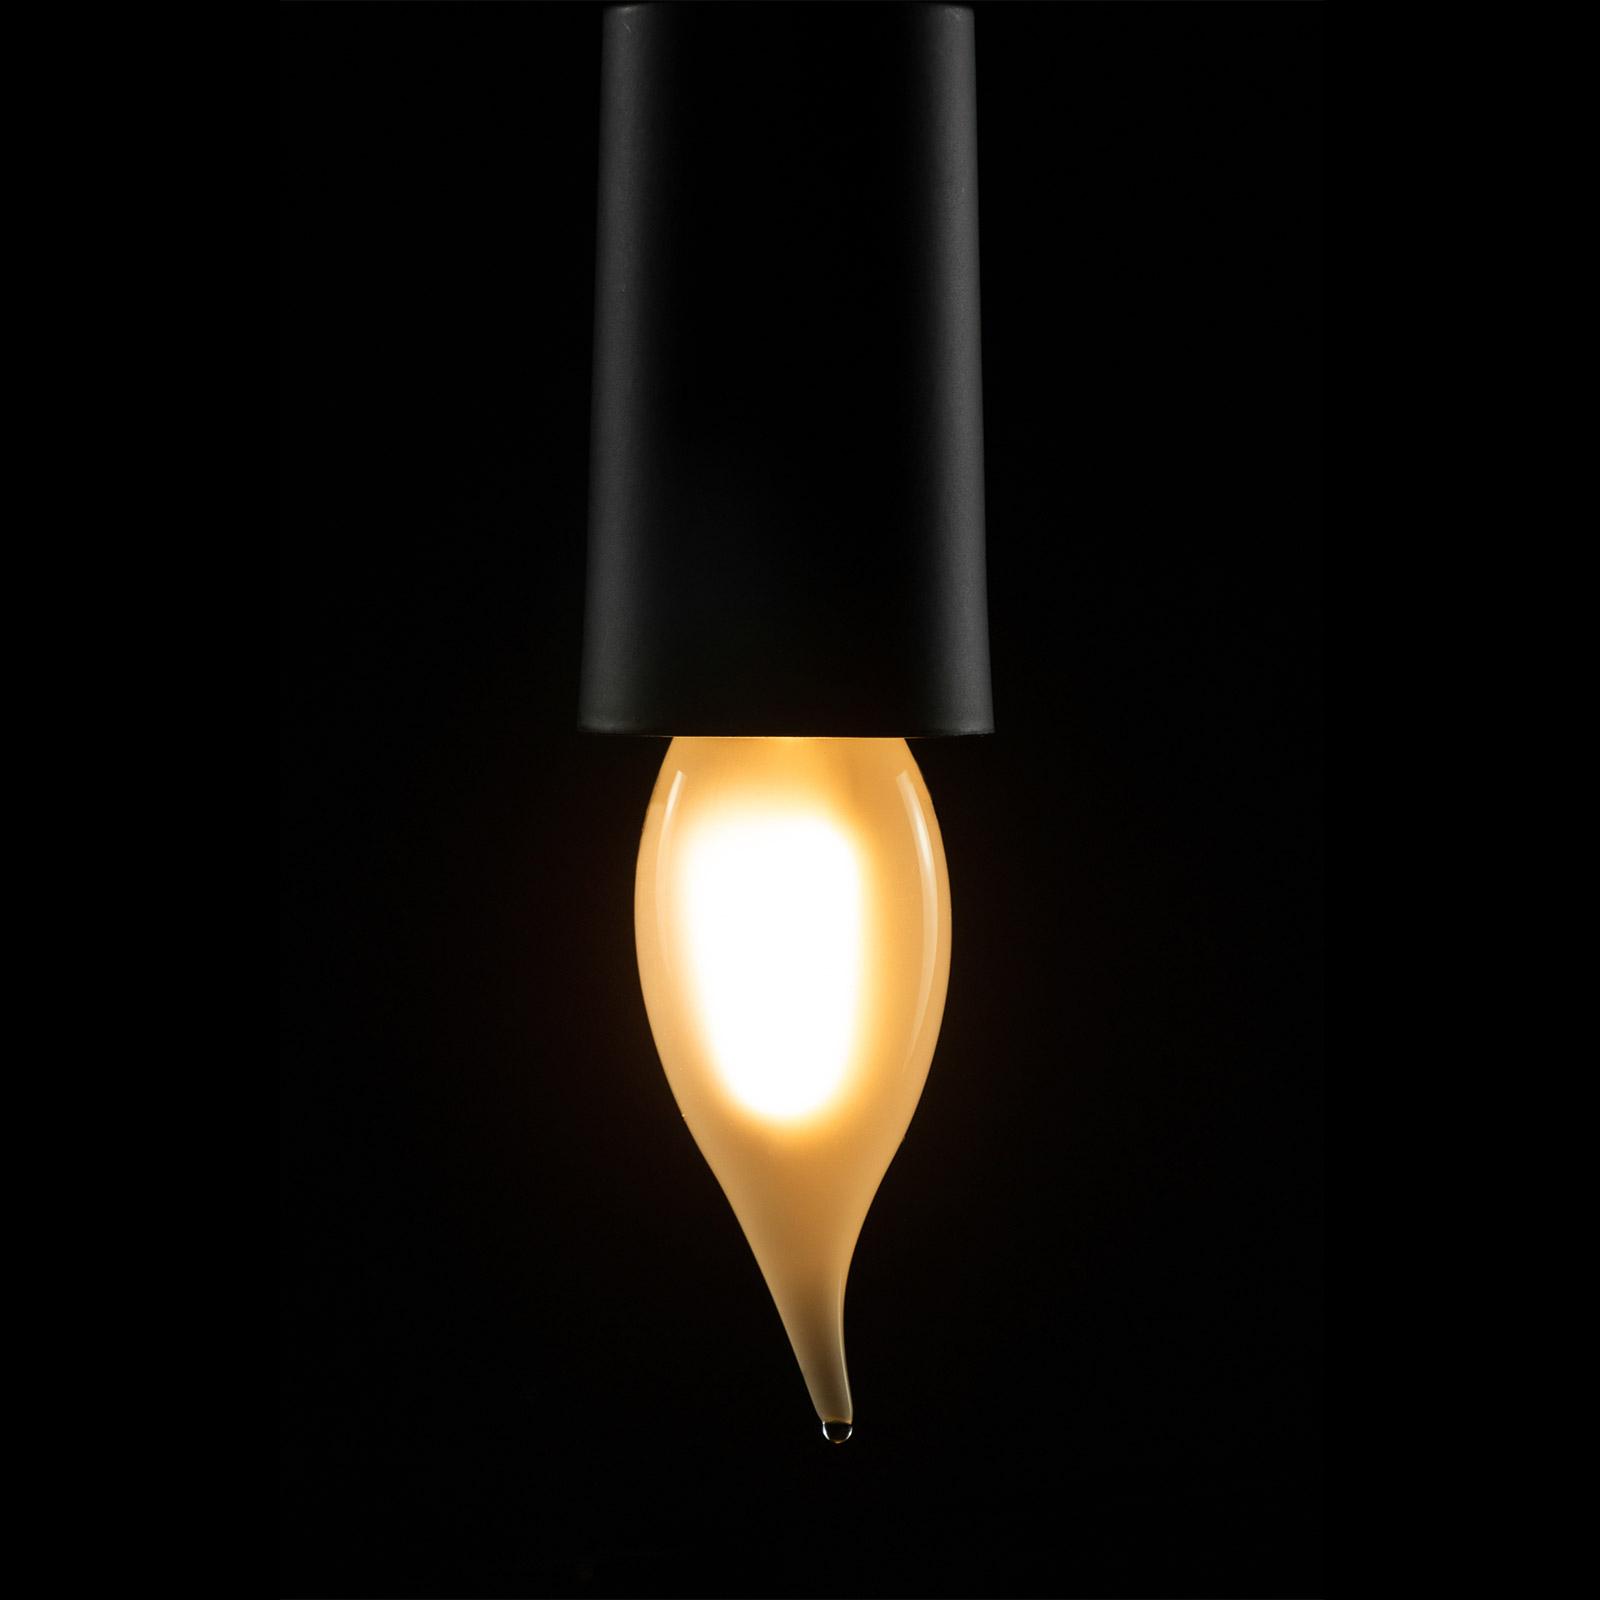 E14 2,7W LED-Windstoß-Kerzenlampe dimmbar matt